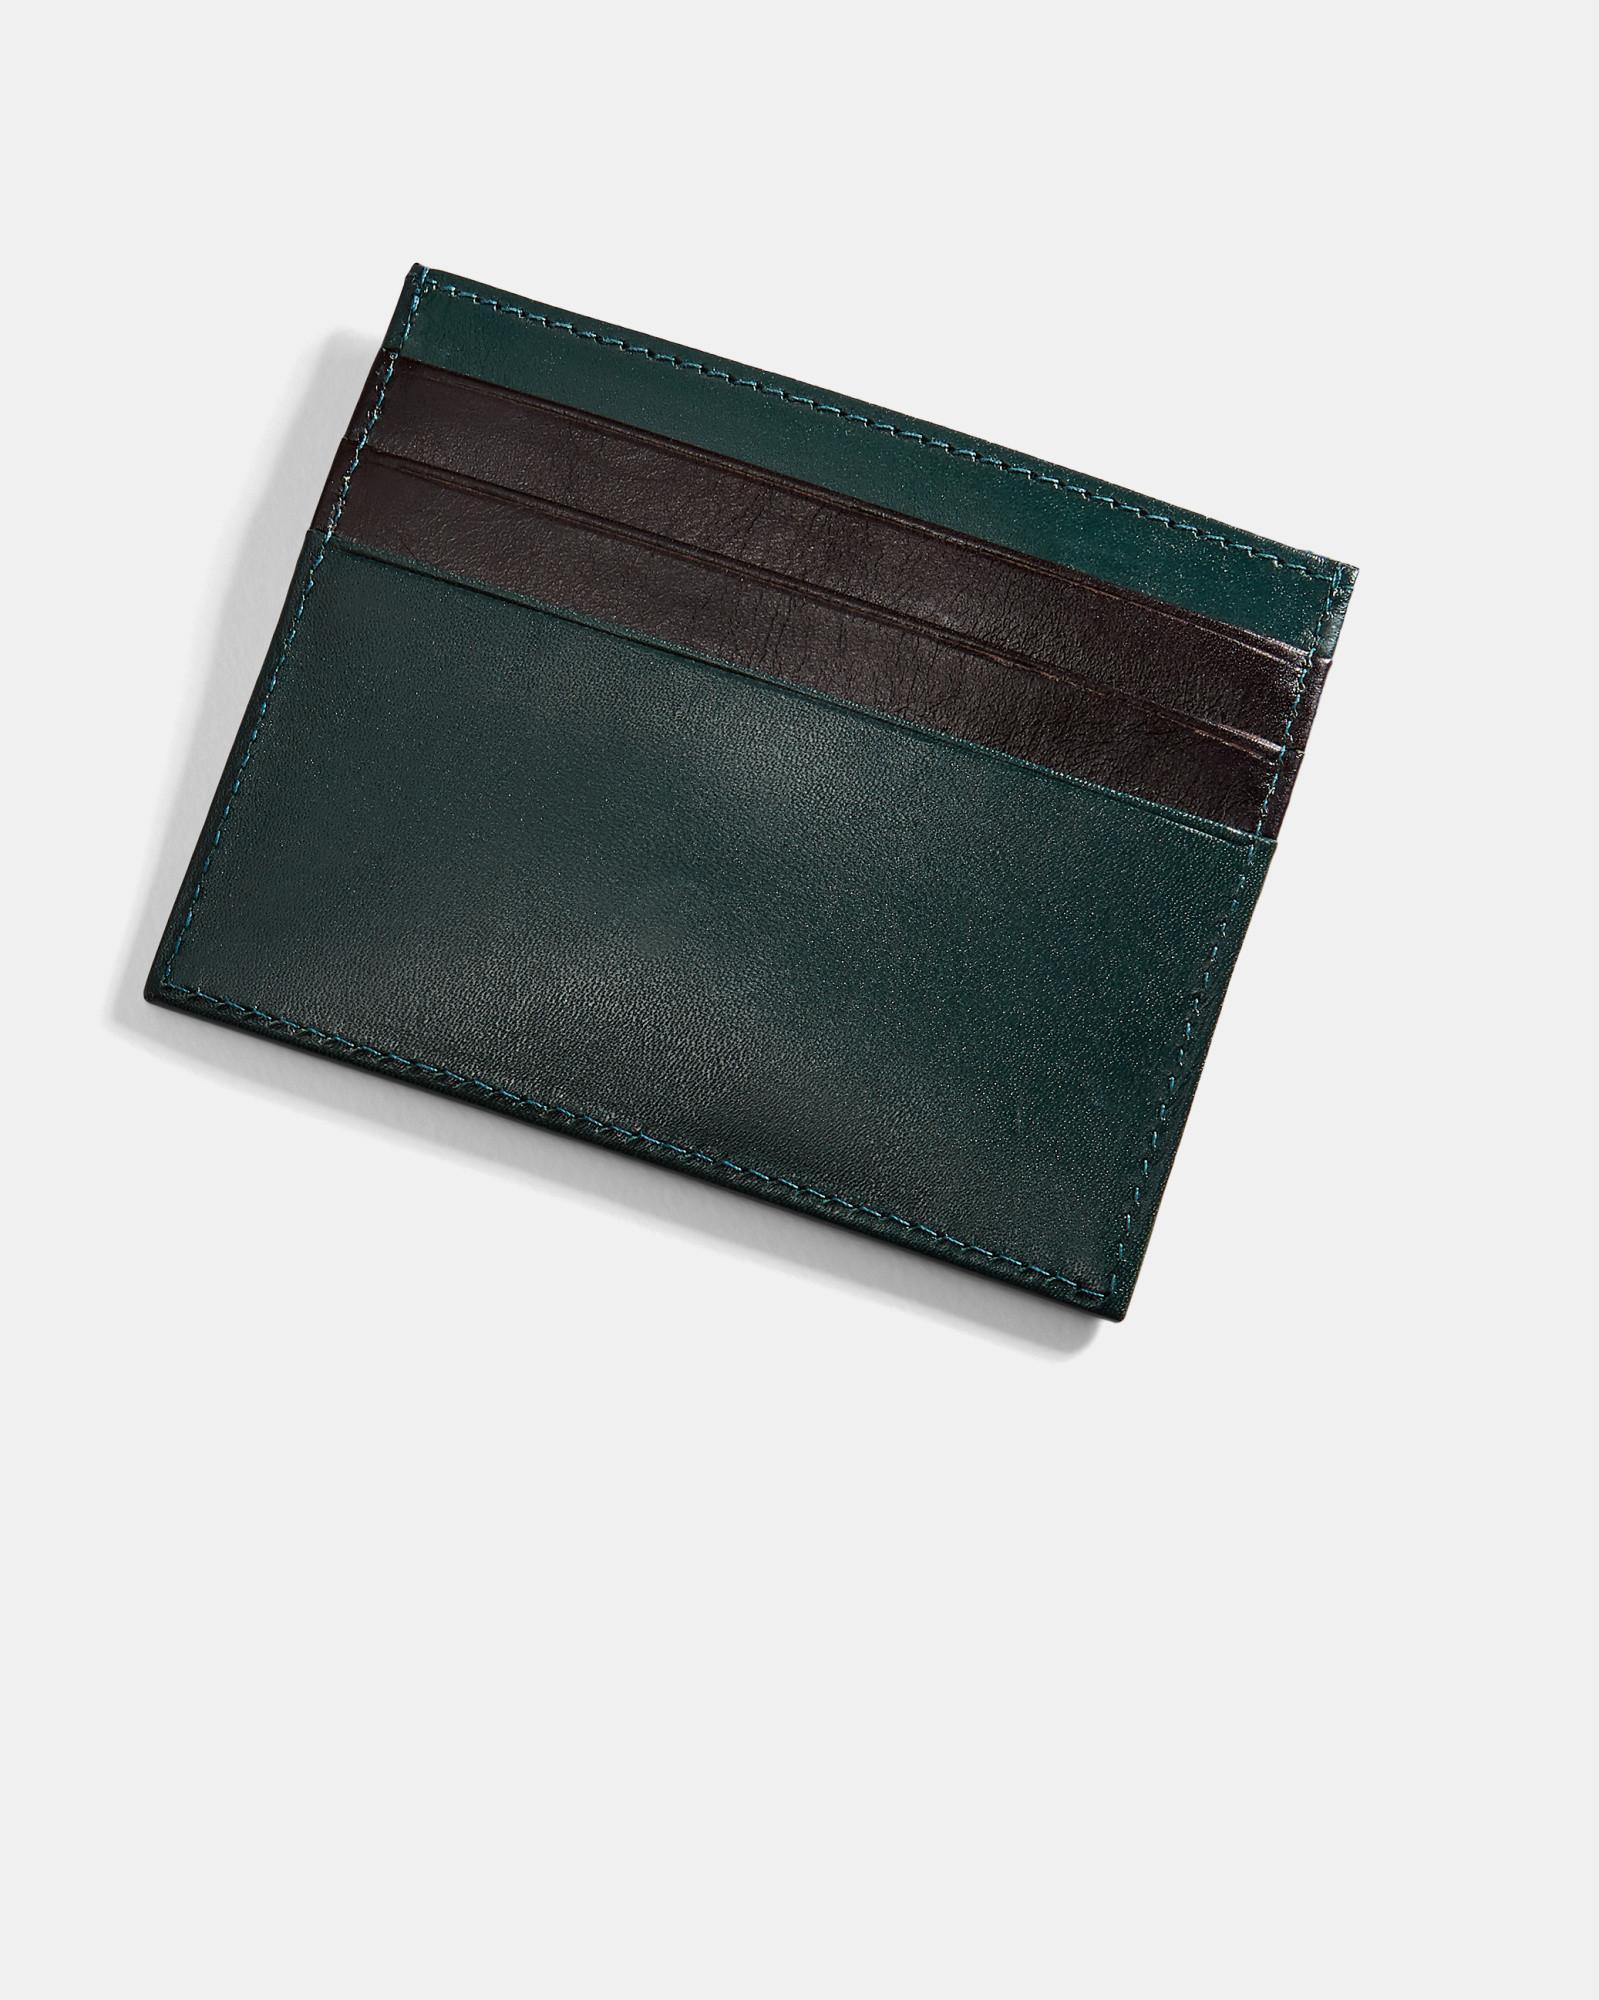 527790ac13b84c Lyst - Ted Baker Contrast Stripe Leather Cardholder in Green for Men